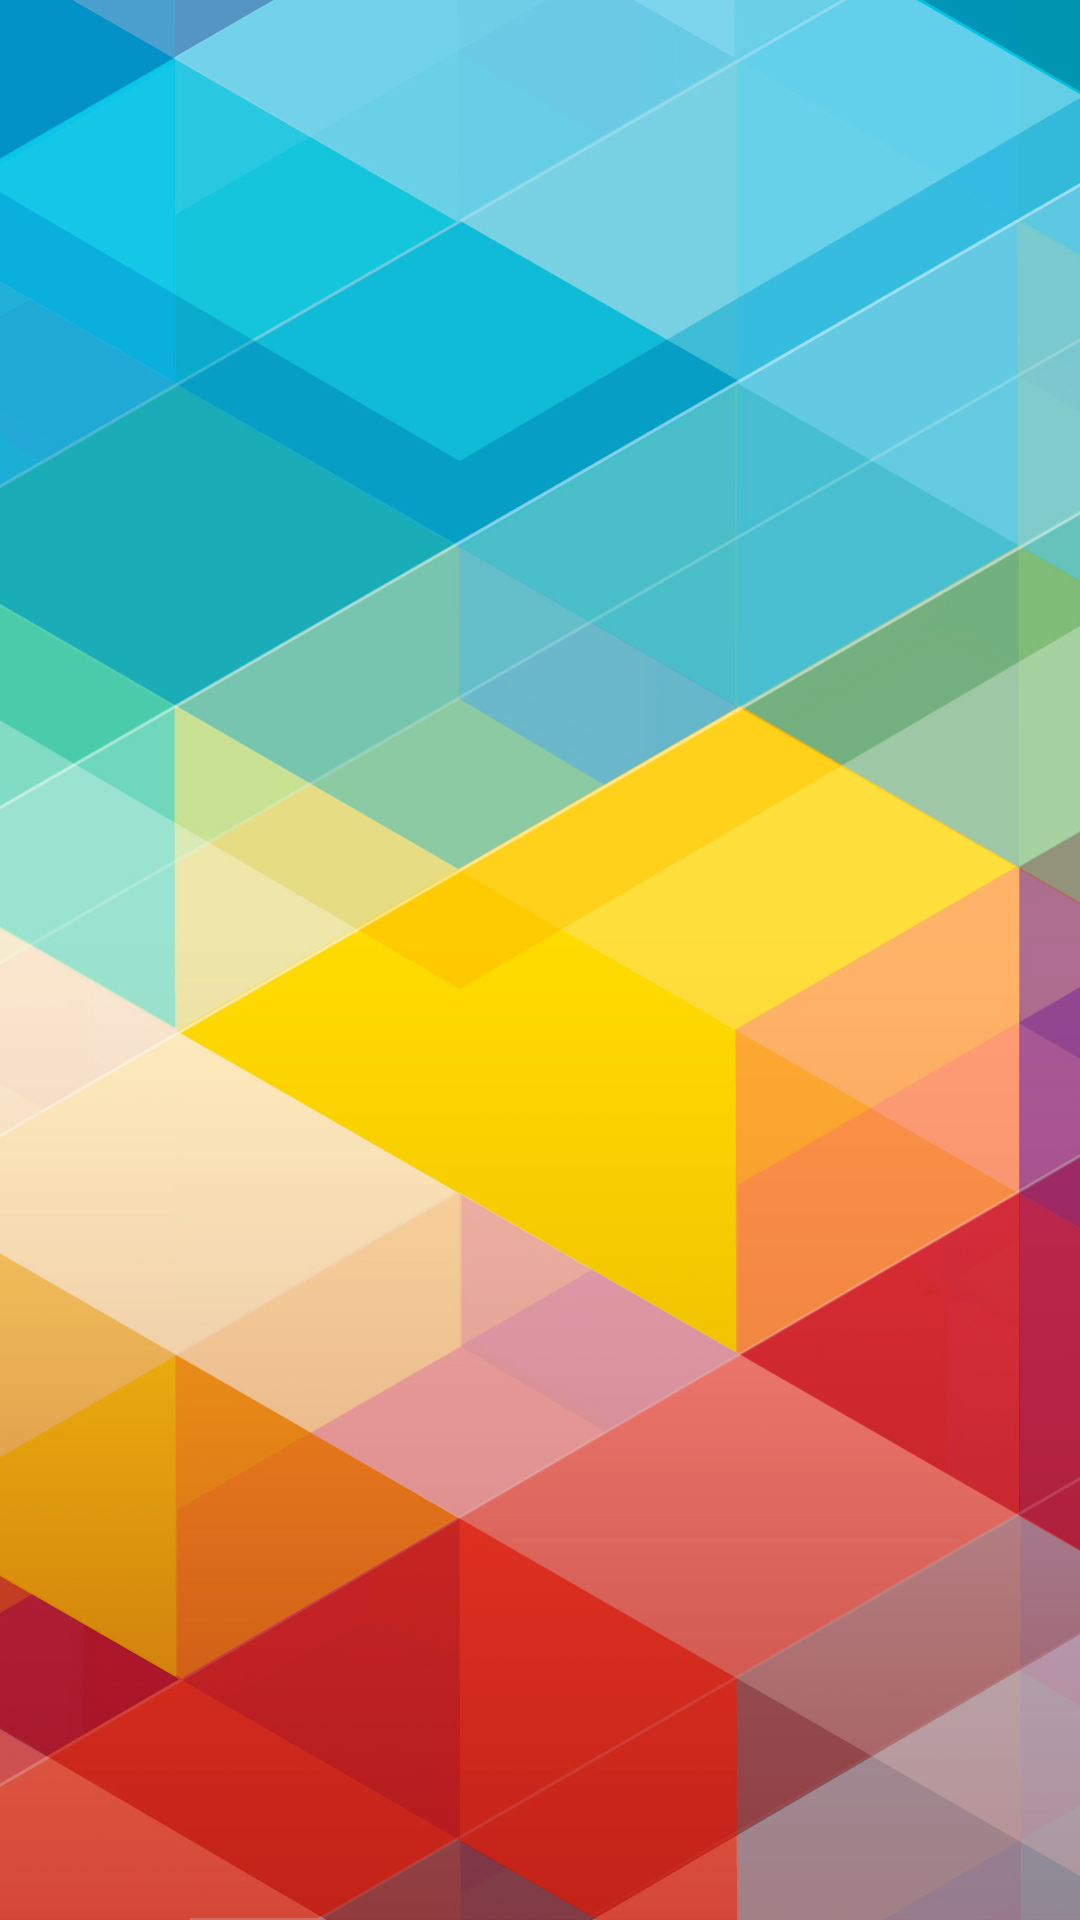 Galaxy S5 Default Background Wallpaper Galaxy S5 Wallpaper 1080x1920 1080x1920